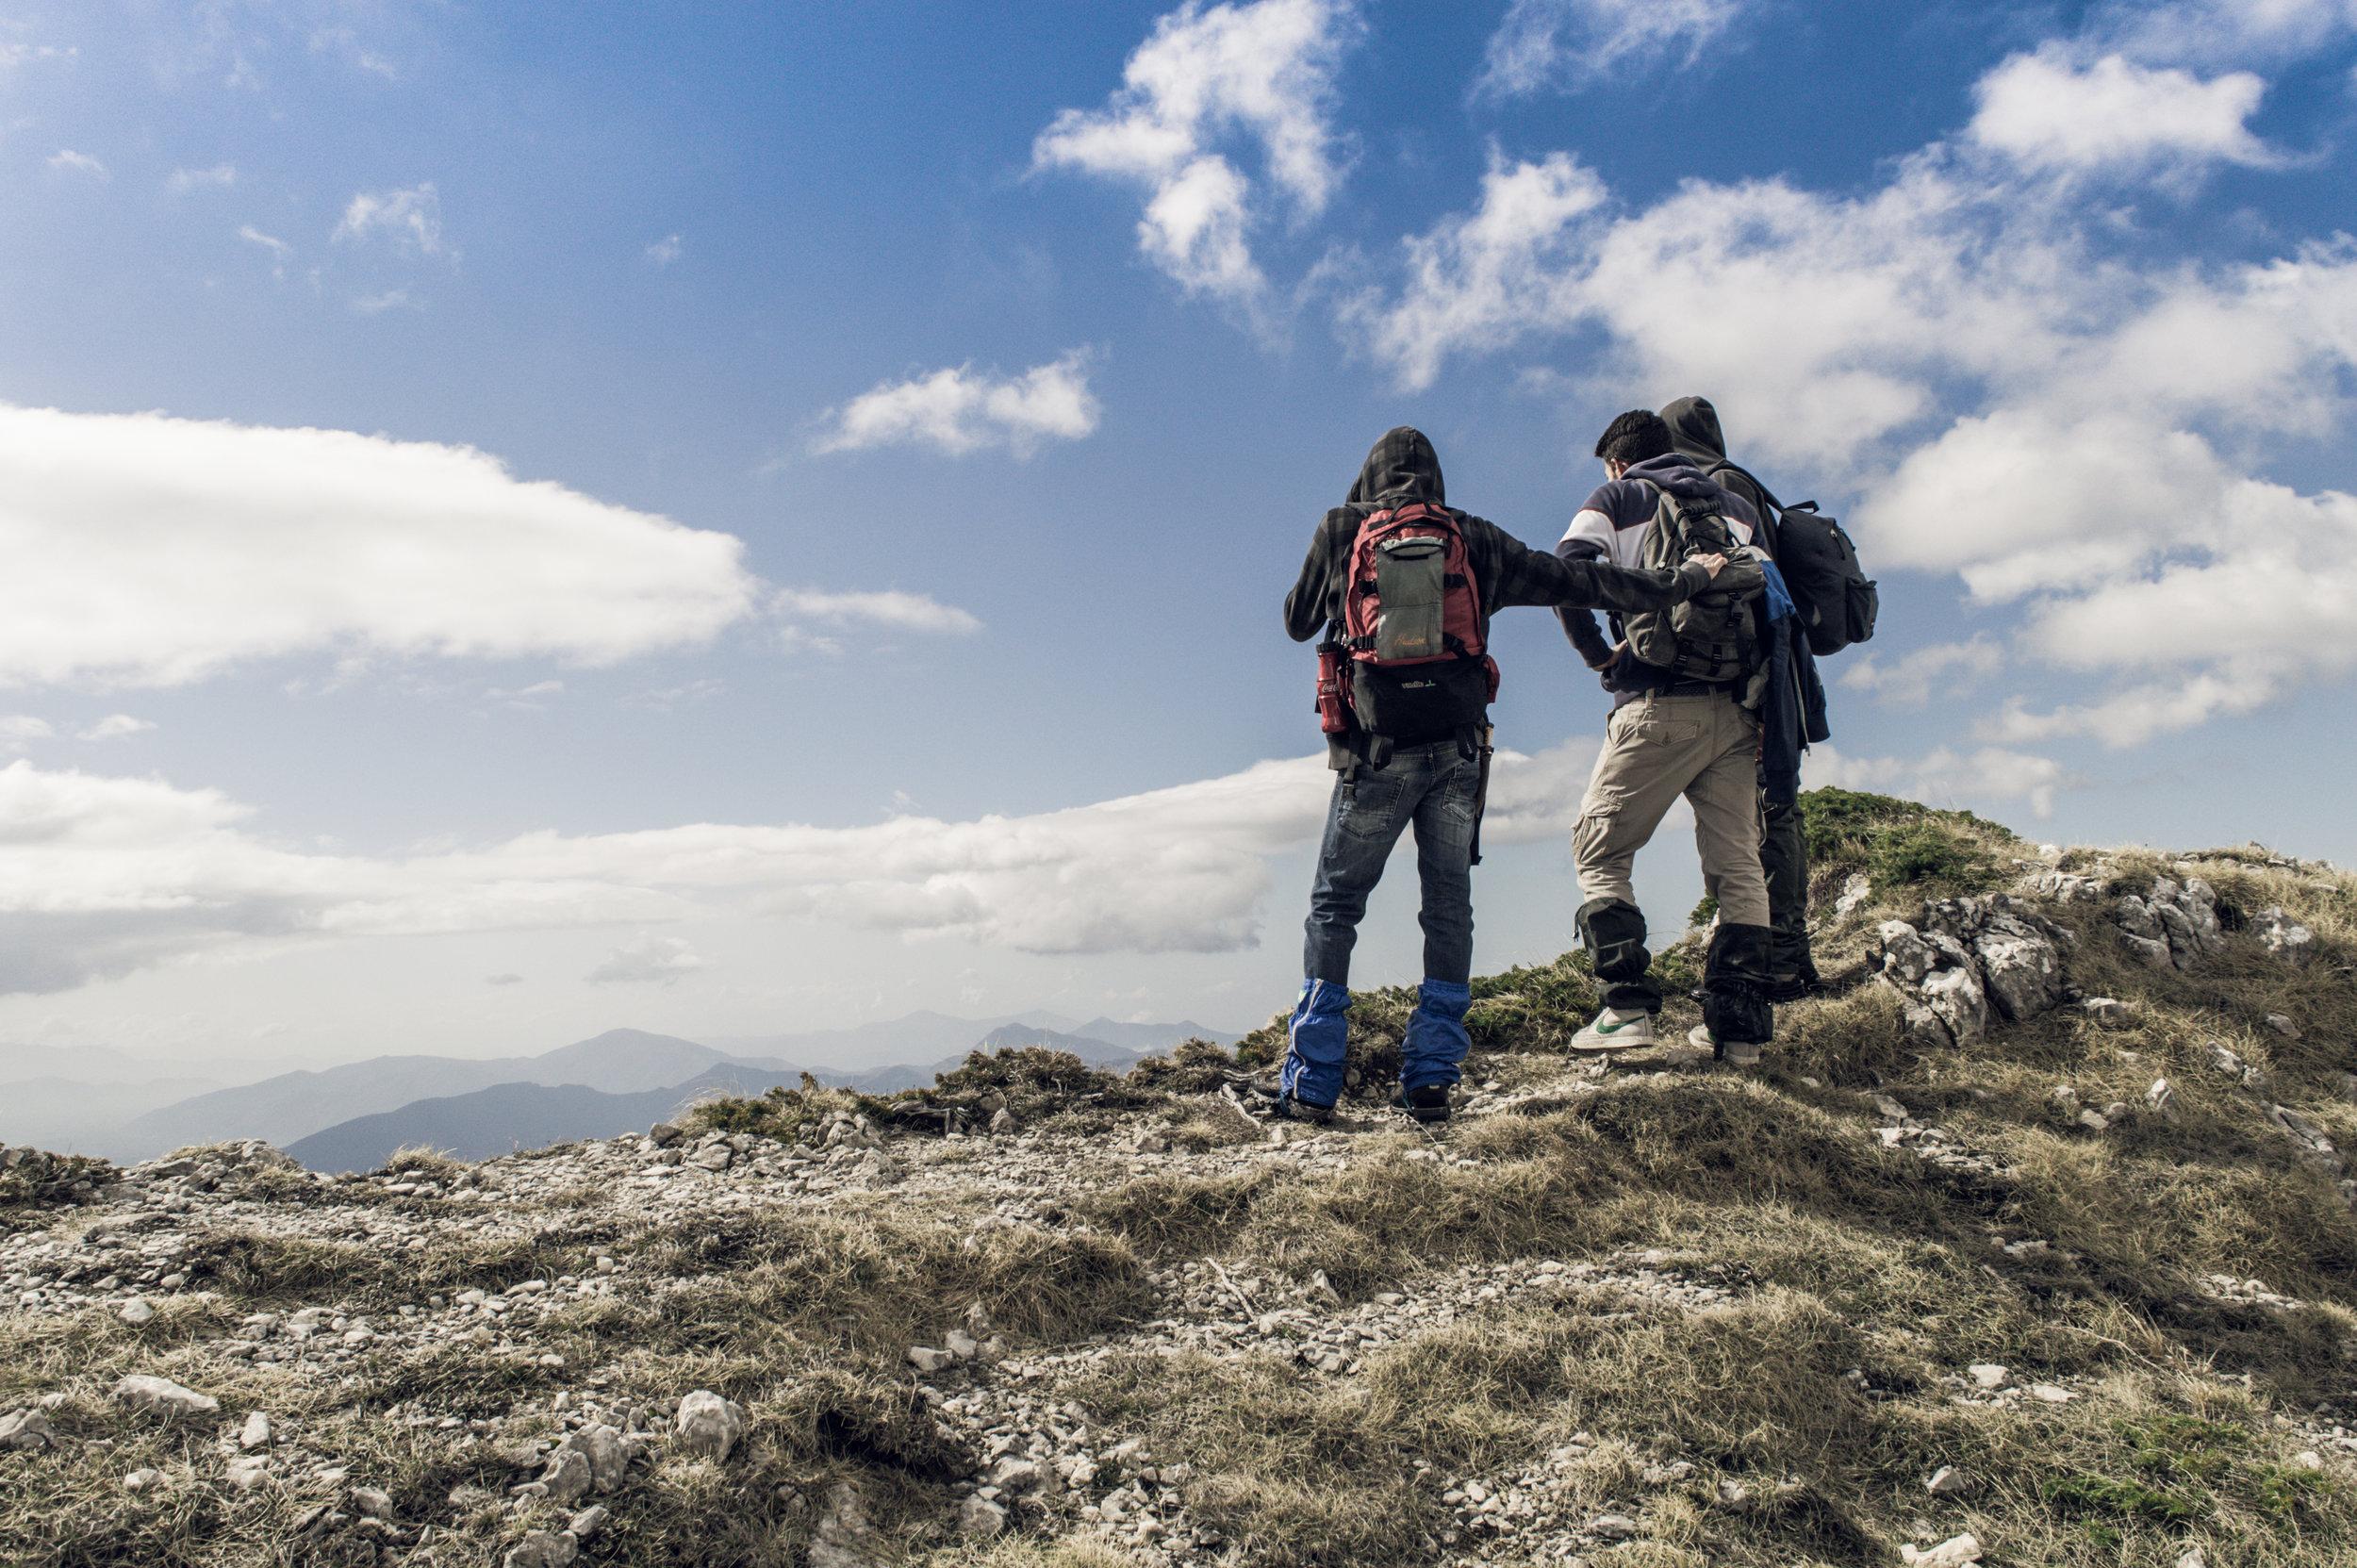 DAy Hiking - Location: Acadia NP, CliftonPrice: $20/personGroup Minimum/Maximum: 4/15